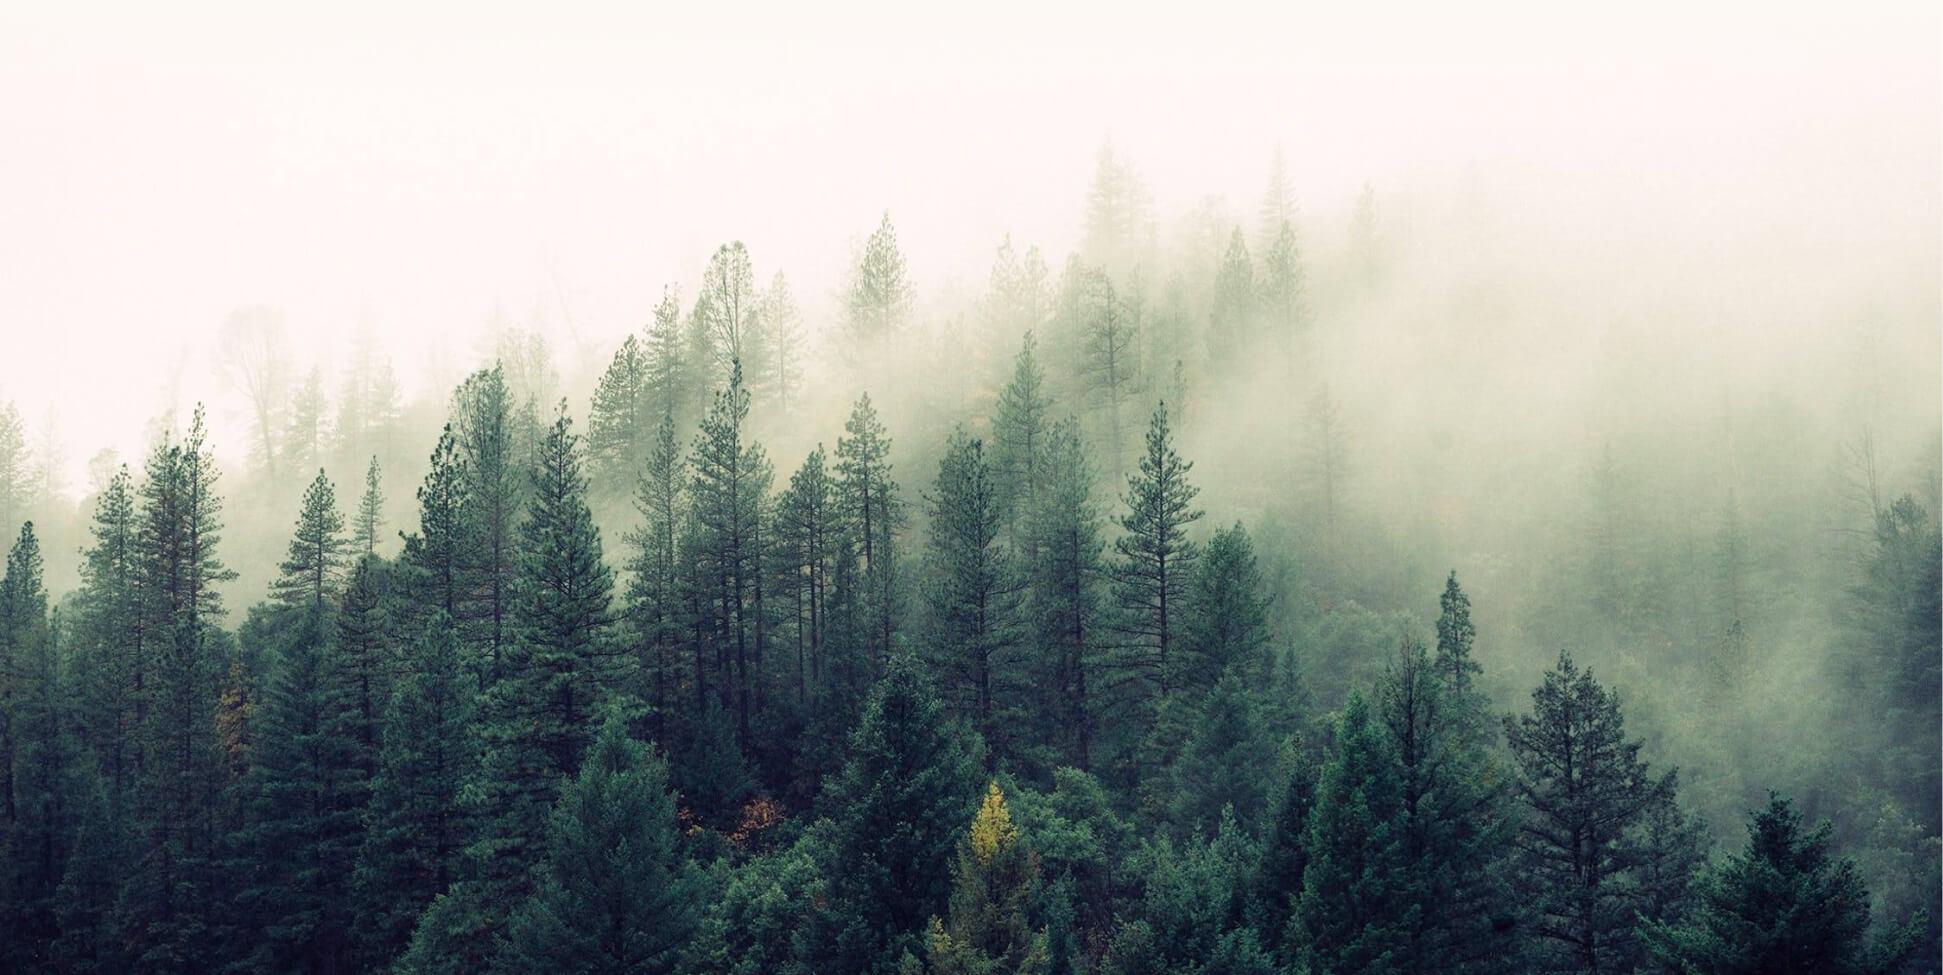 A misty green forest landscape.